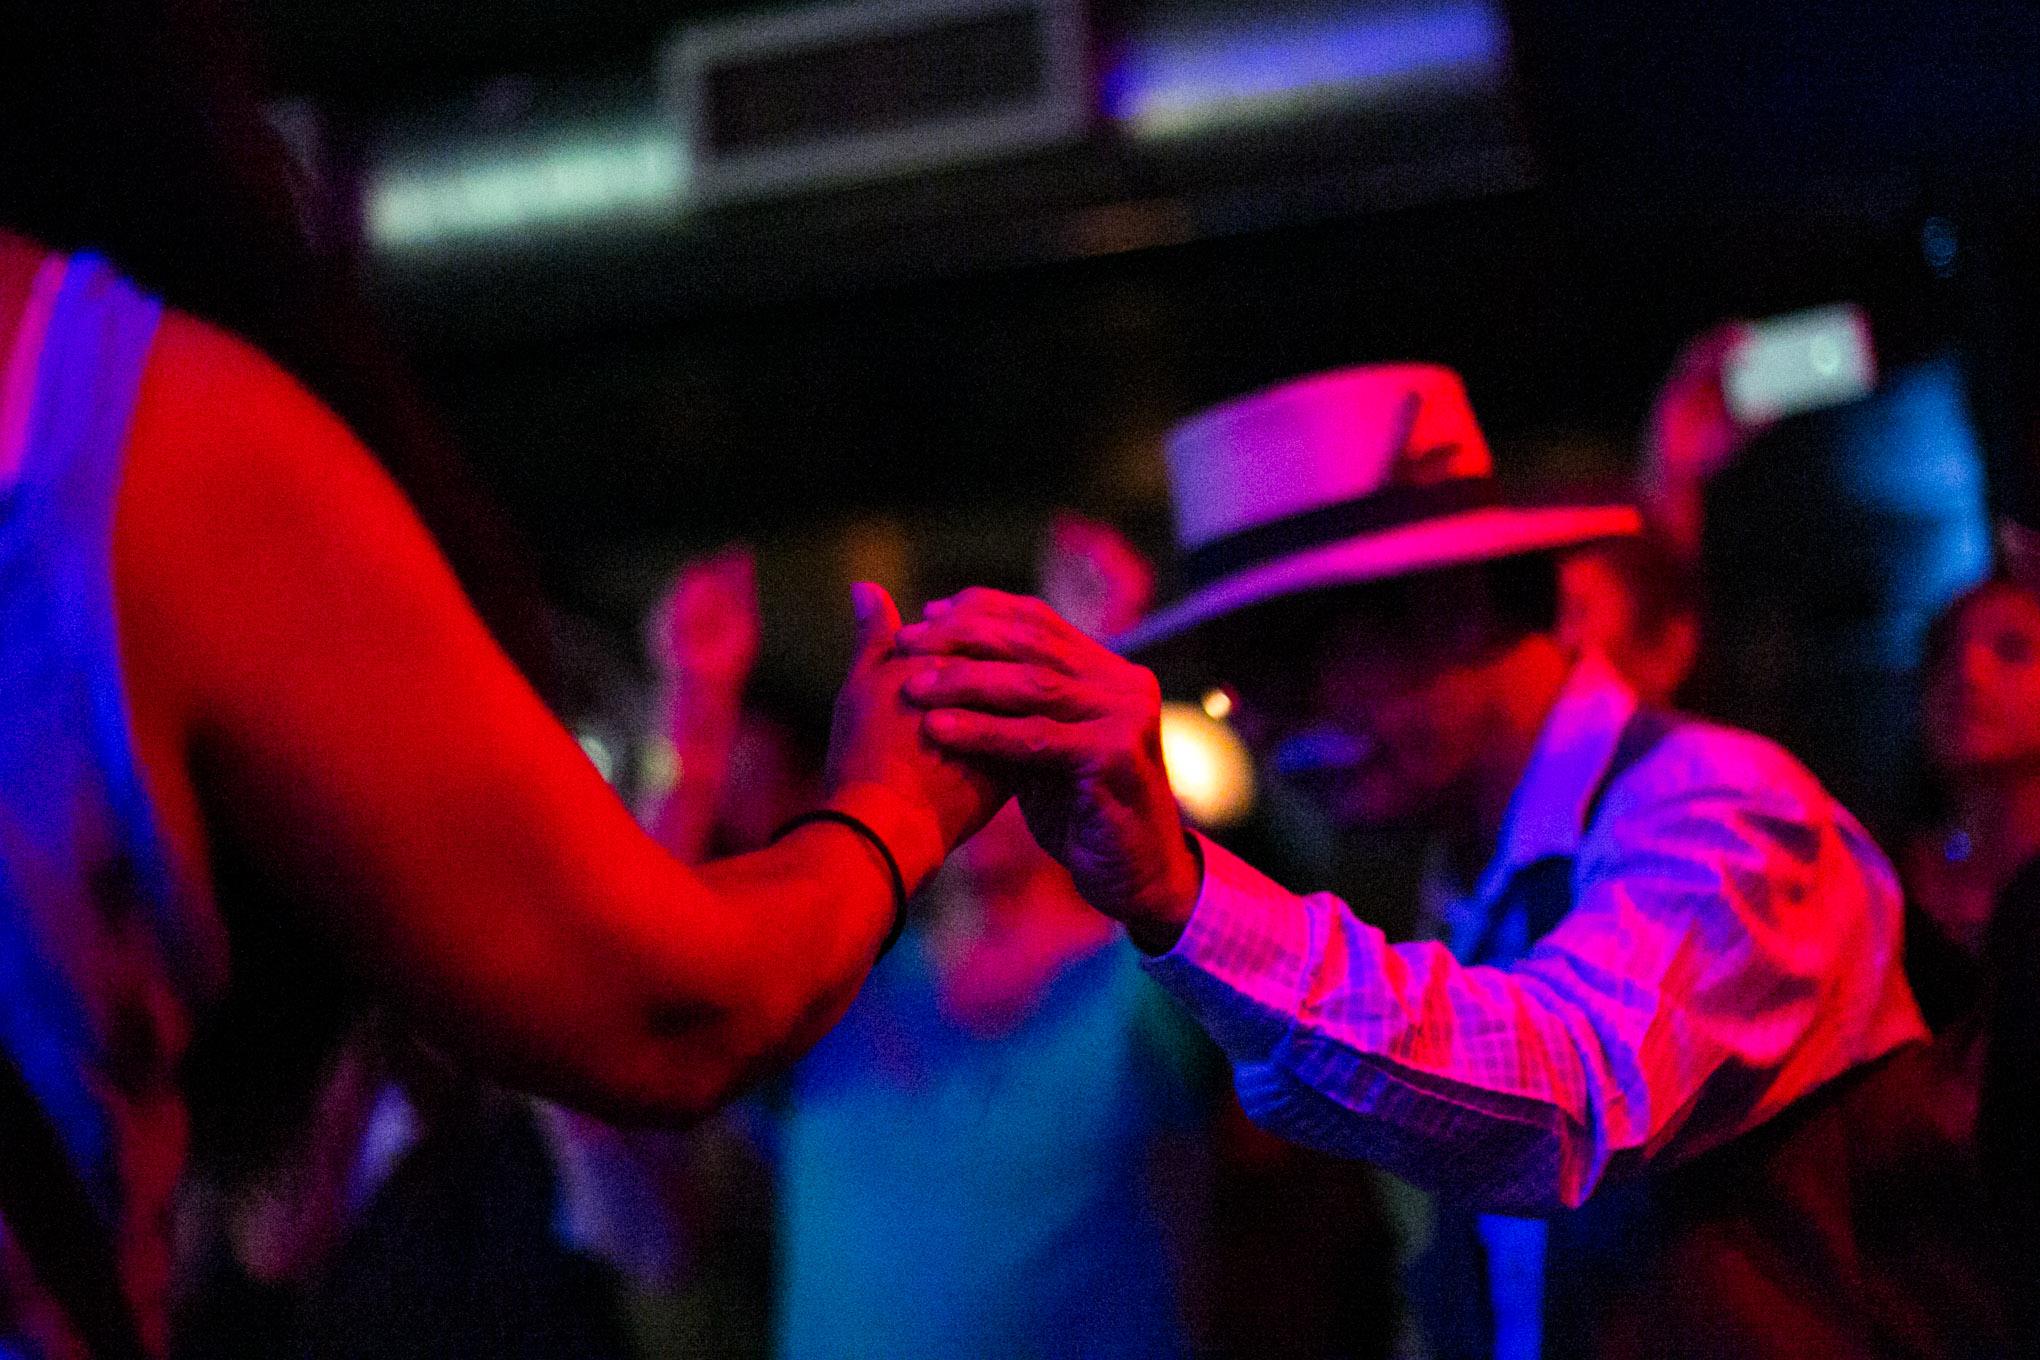 Couples dance to the conjunto music of Acordeón Eva Ybarra. Photo by Kathryn Boyd-Batstone.